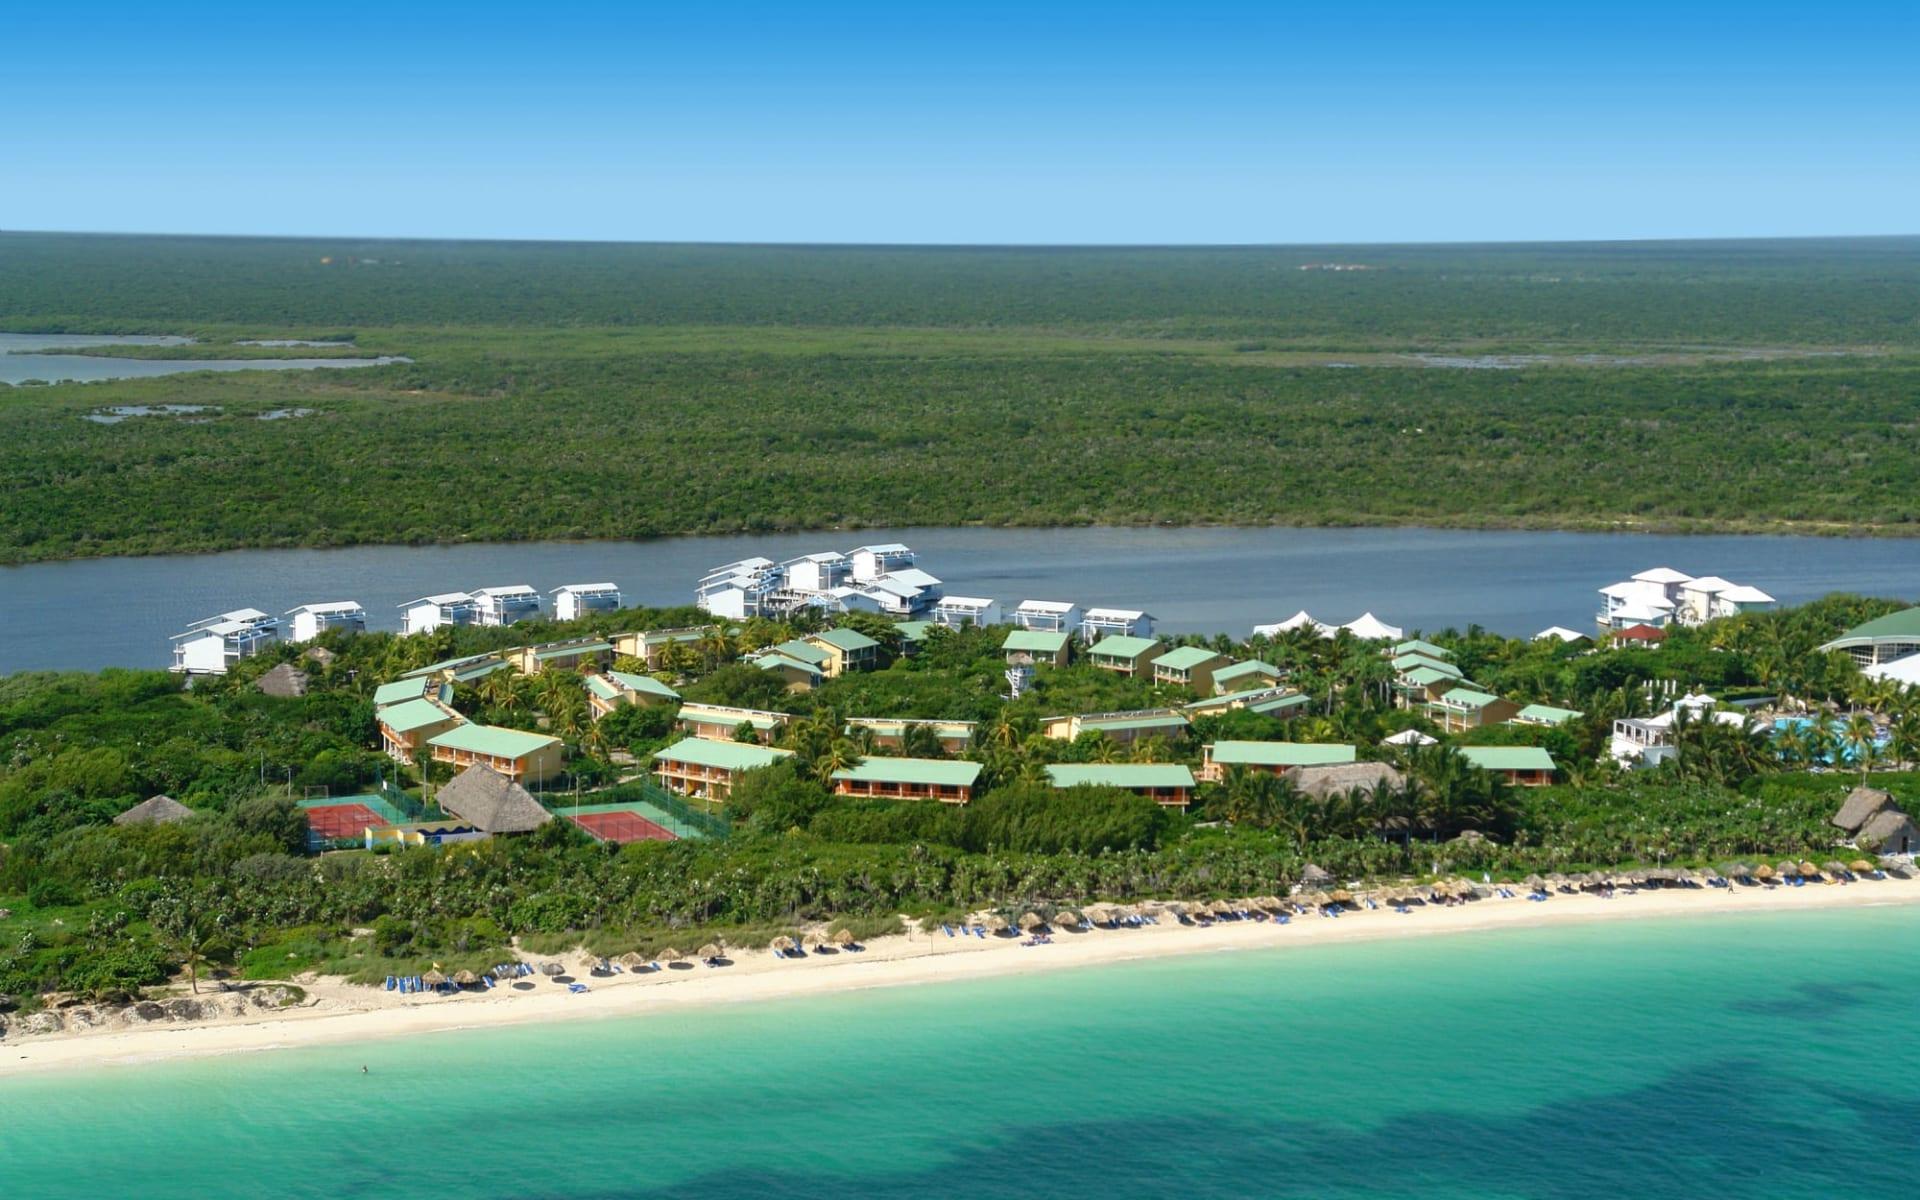 Melia Cayo Coco:  Exterior Melia Cayo Coco Kuba - Vogelperspektive C Melia Hotels